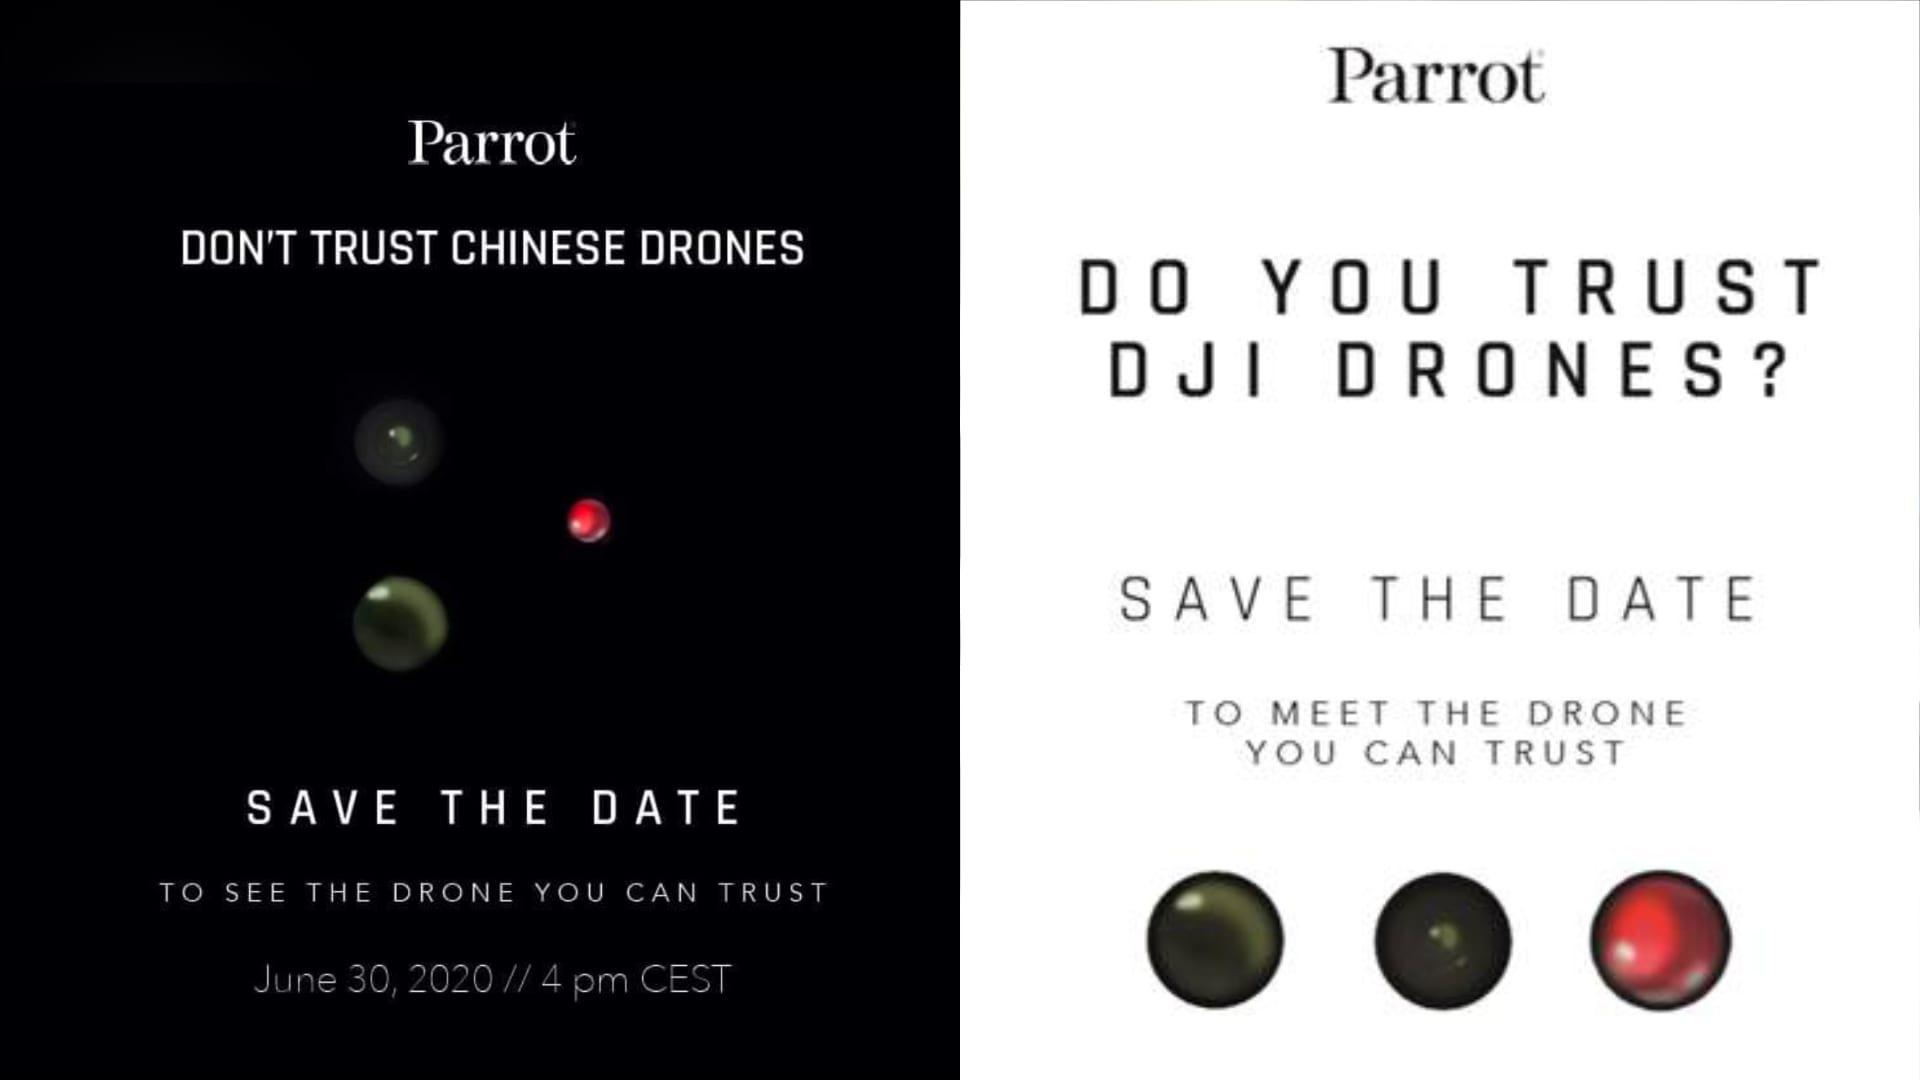 Parrot发布会、宣传会海报